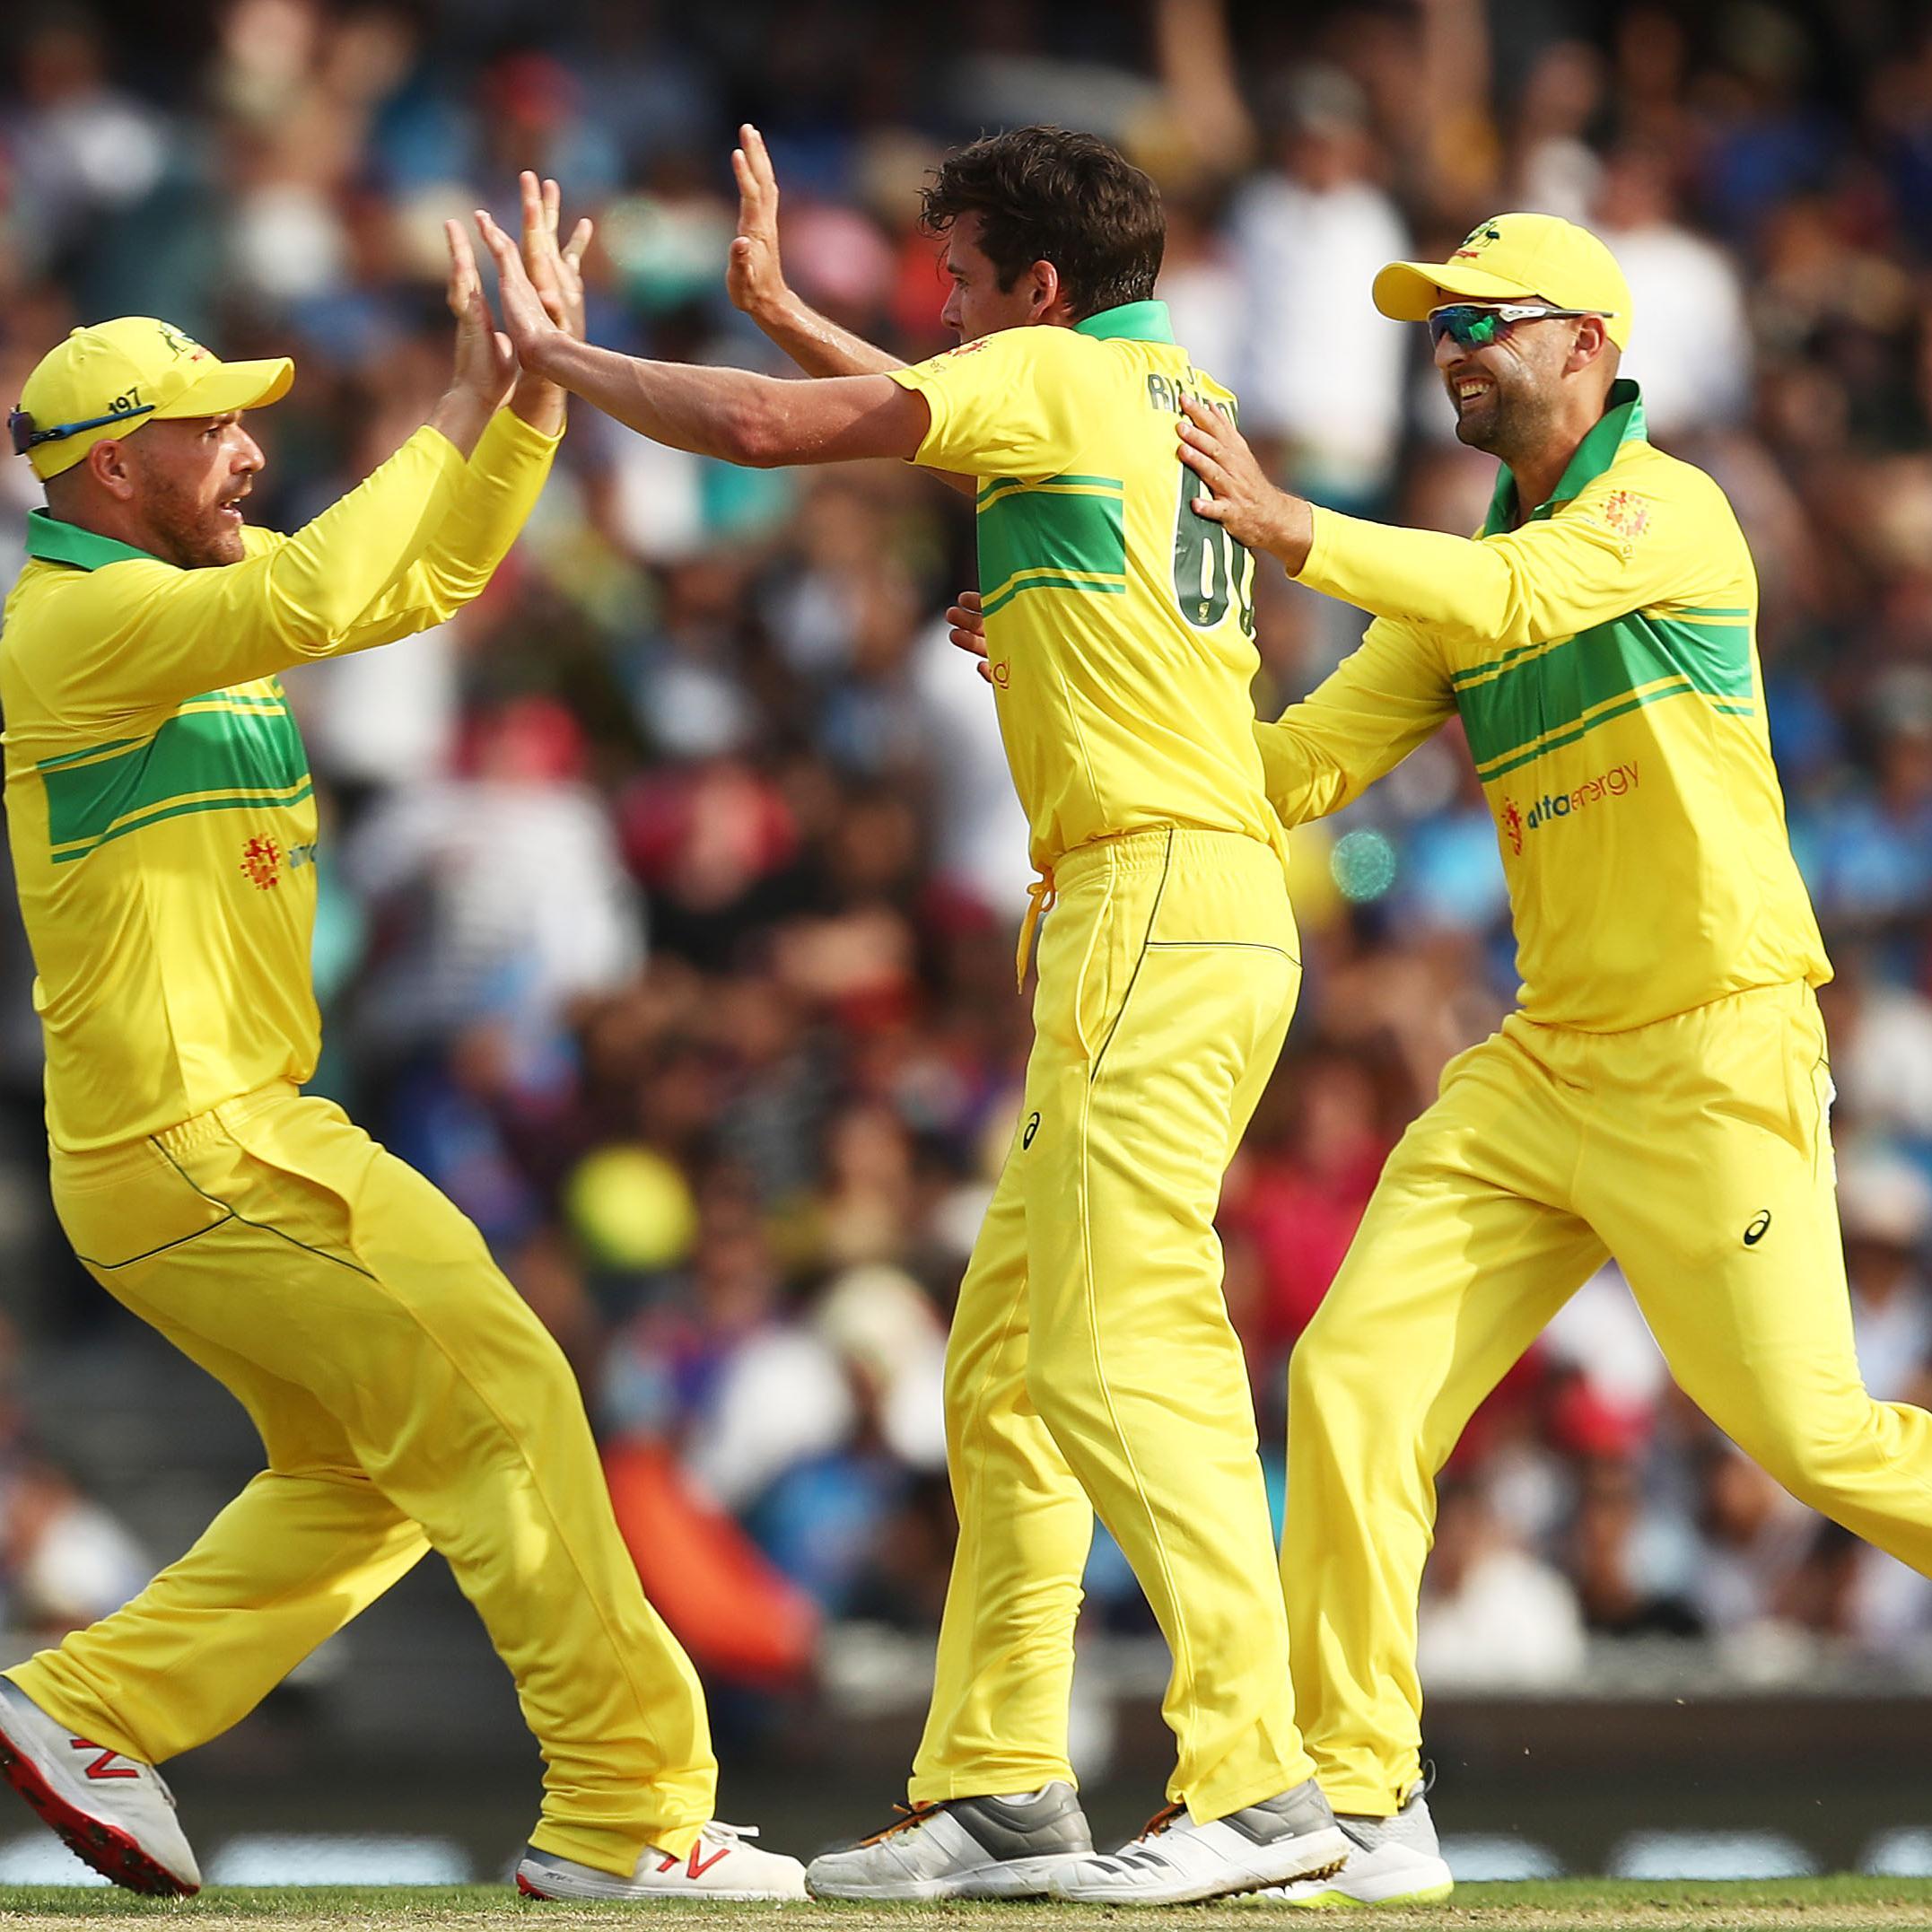 177be4ade56 India beat Australia by 7 wickets (with 4 balls remaining) - Australia vs  India 3rd ODI Match Summary